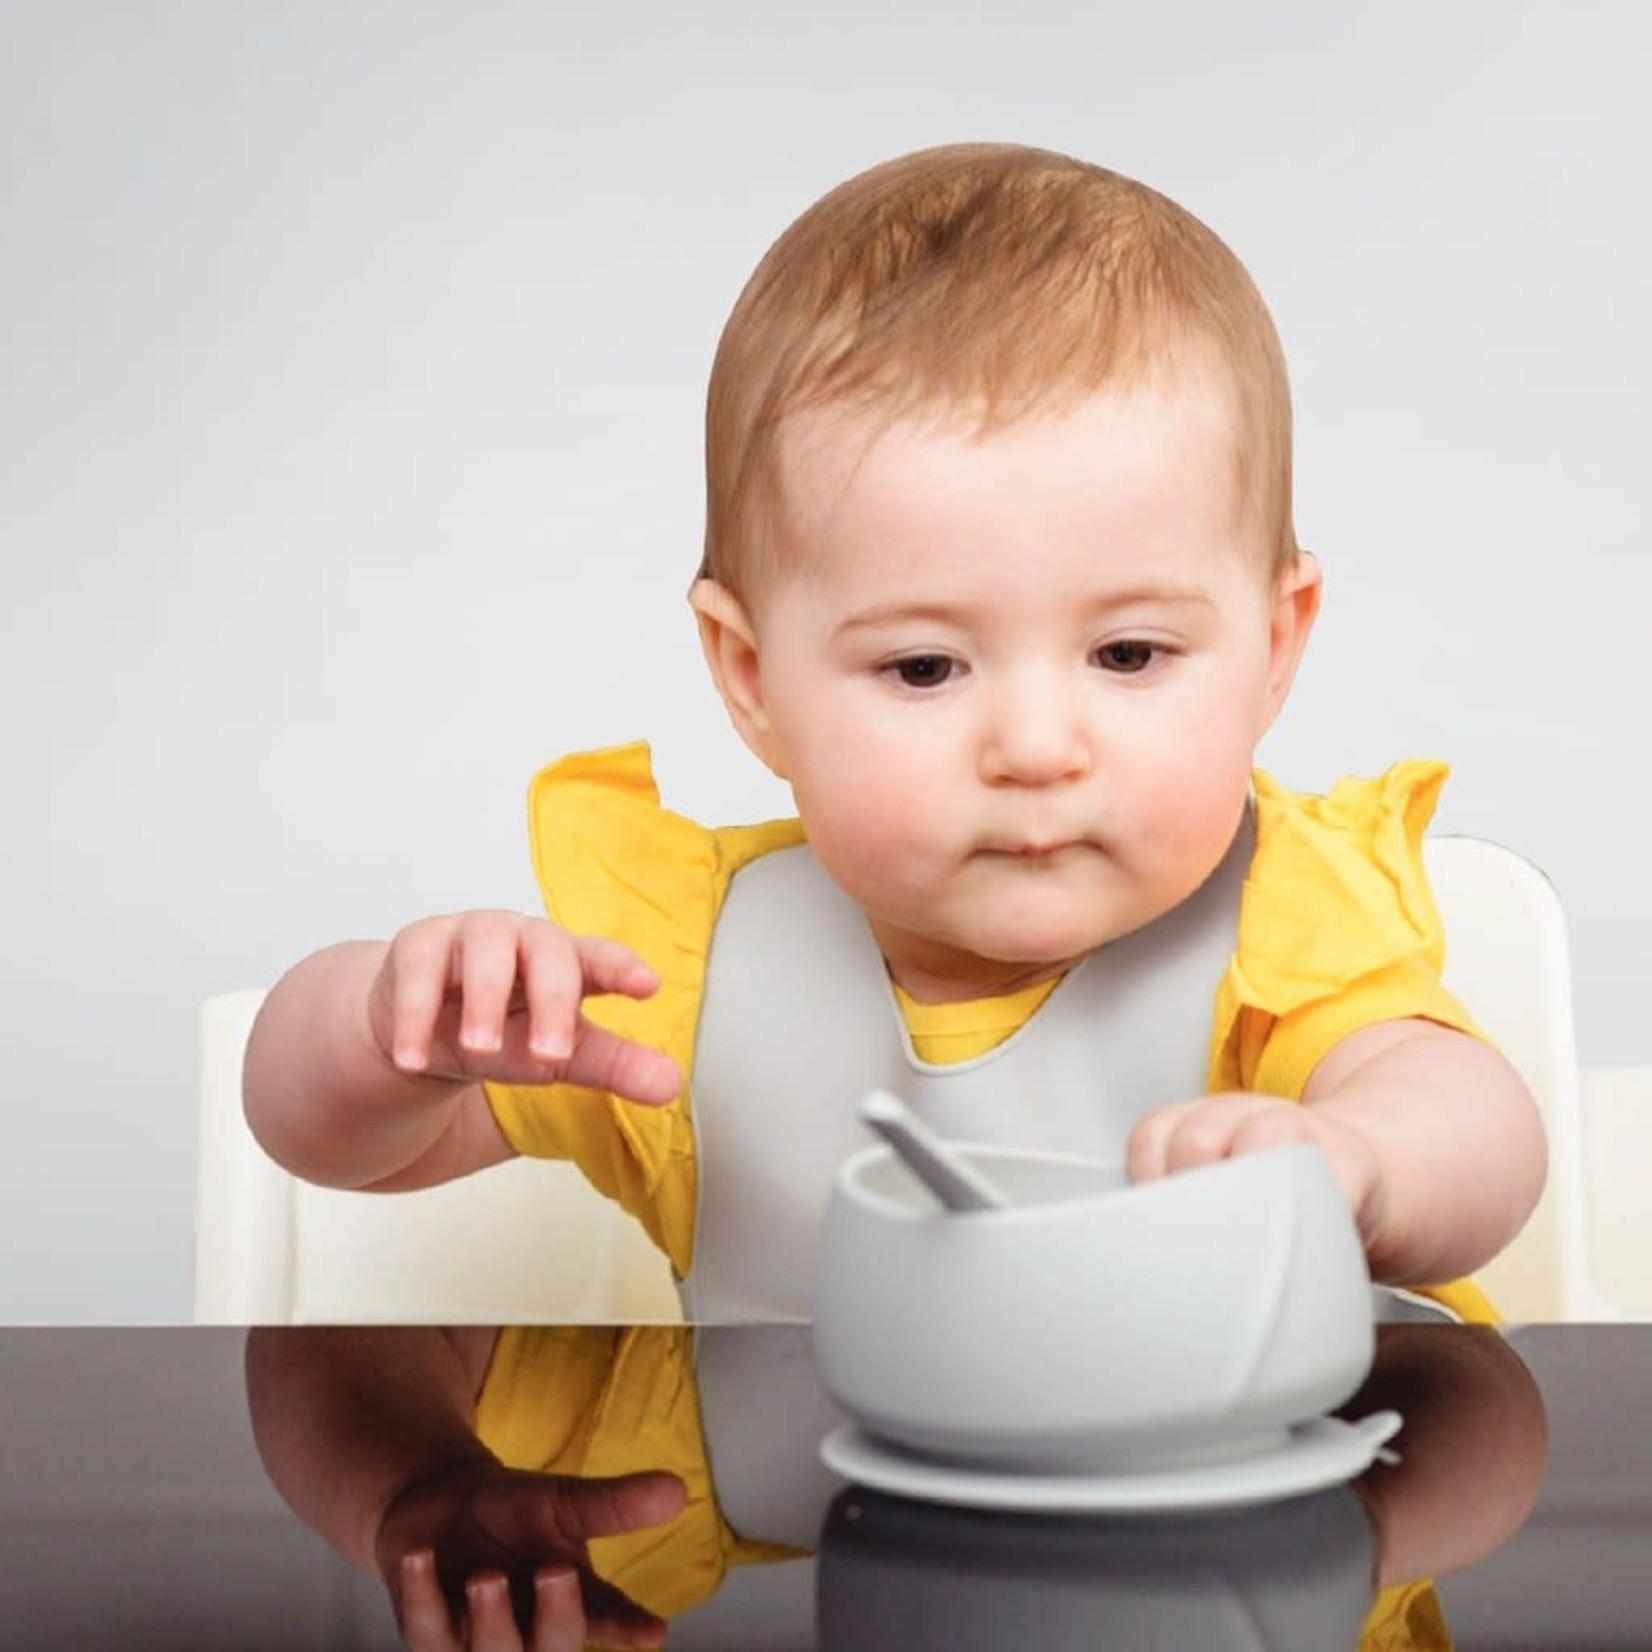 Everyday Baby SILICONE KOM LICHTGRIJS